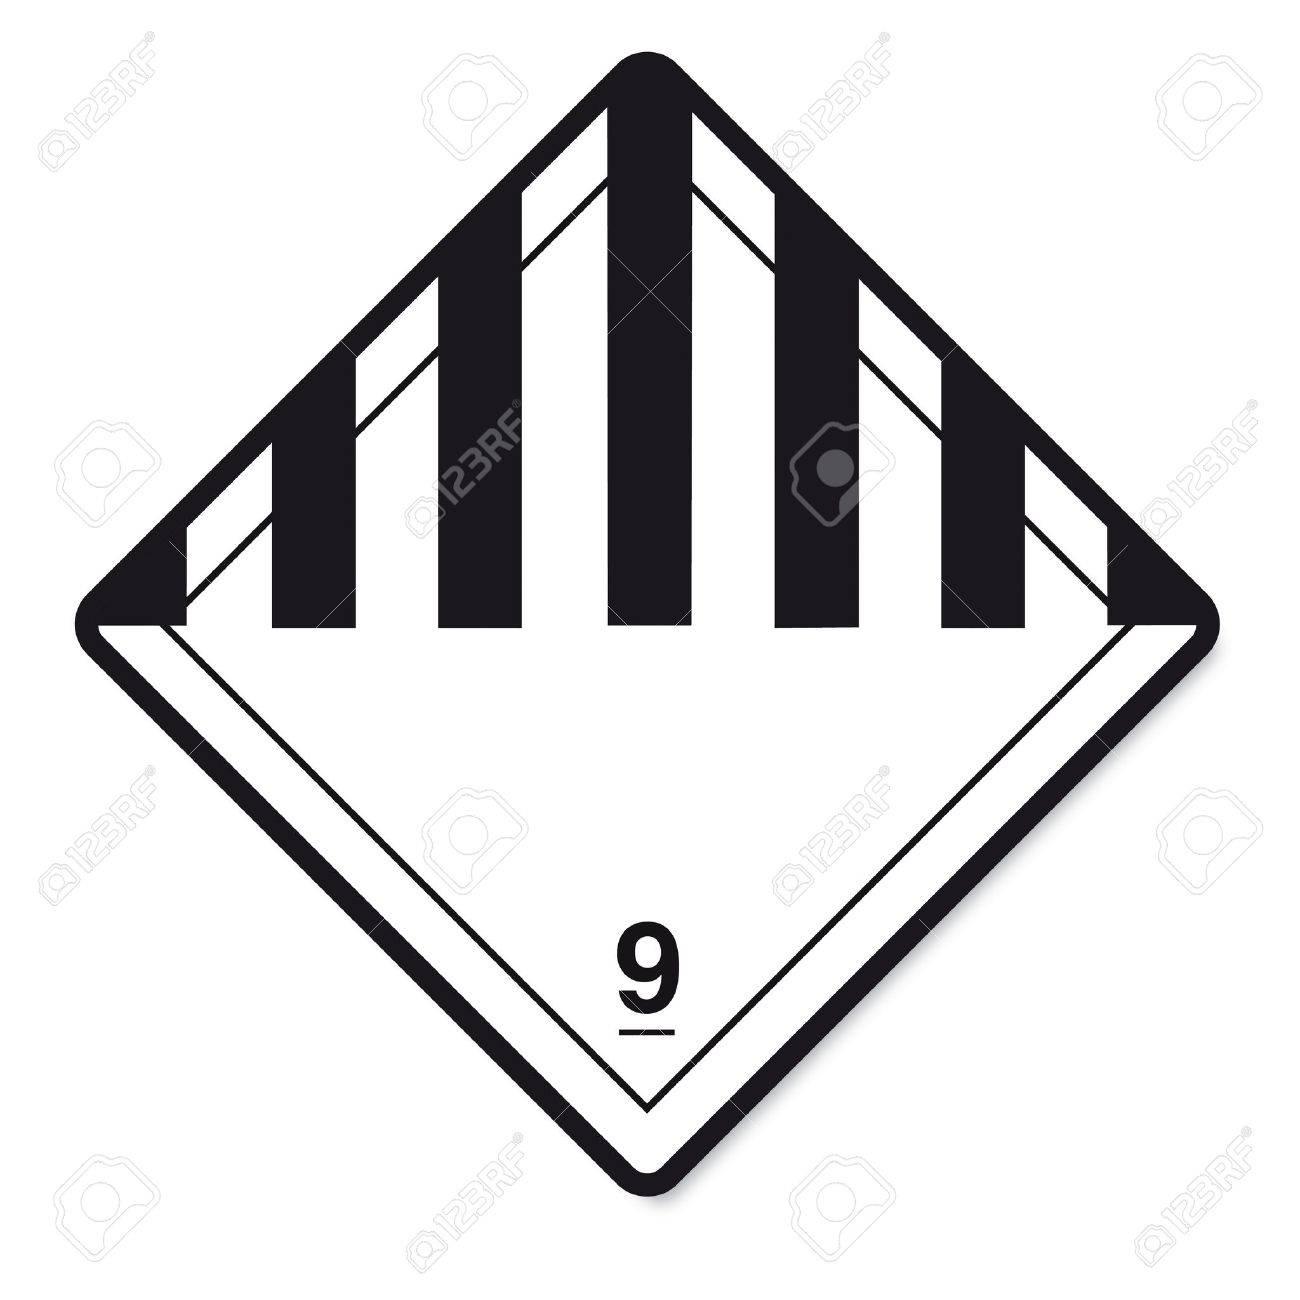 Hazardous substances signs icon flammable skull radioactive hazard corrosive Stock Vector - 14380212